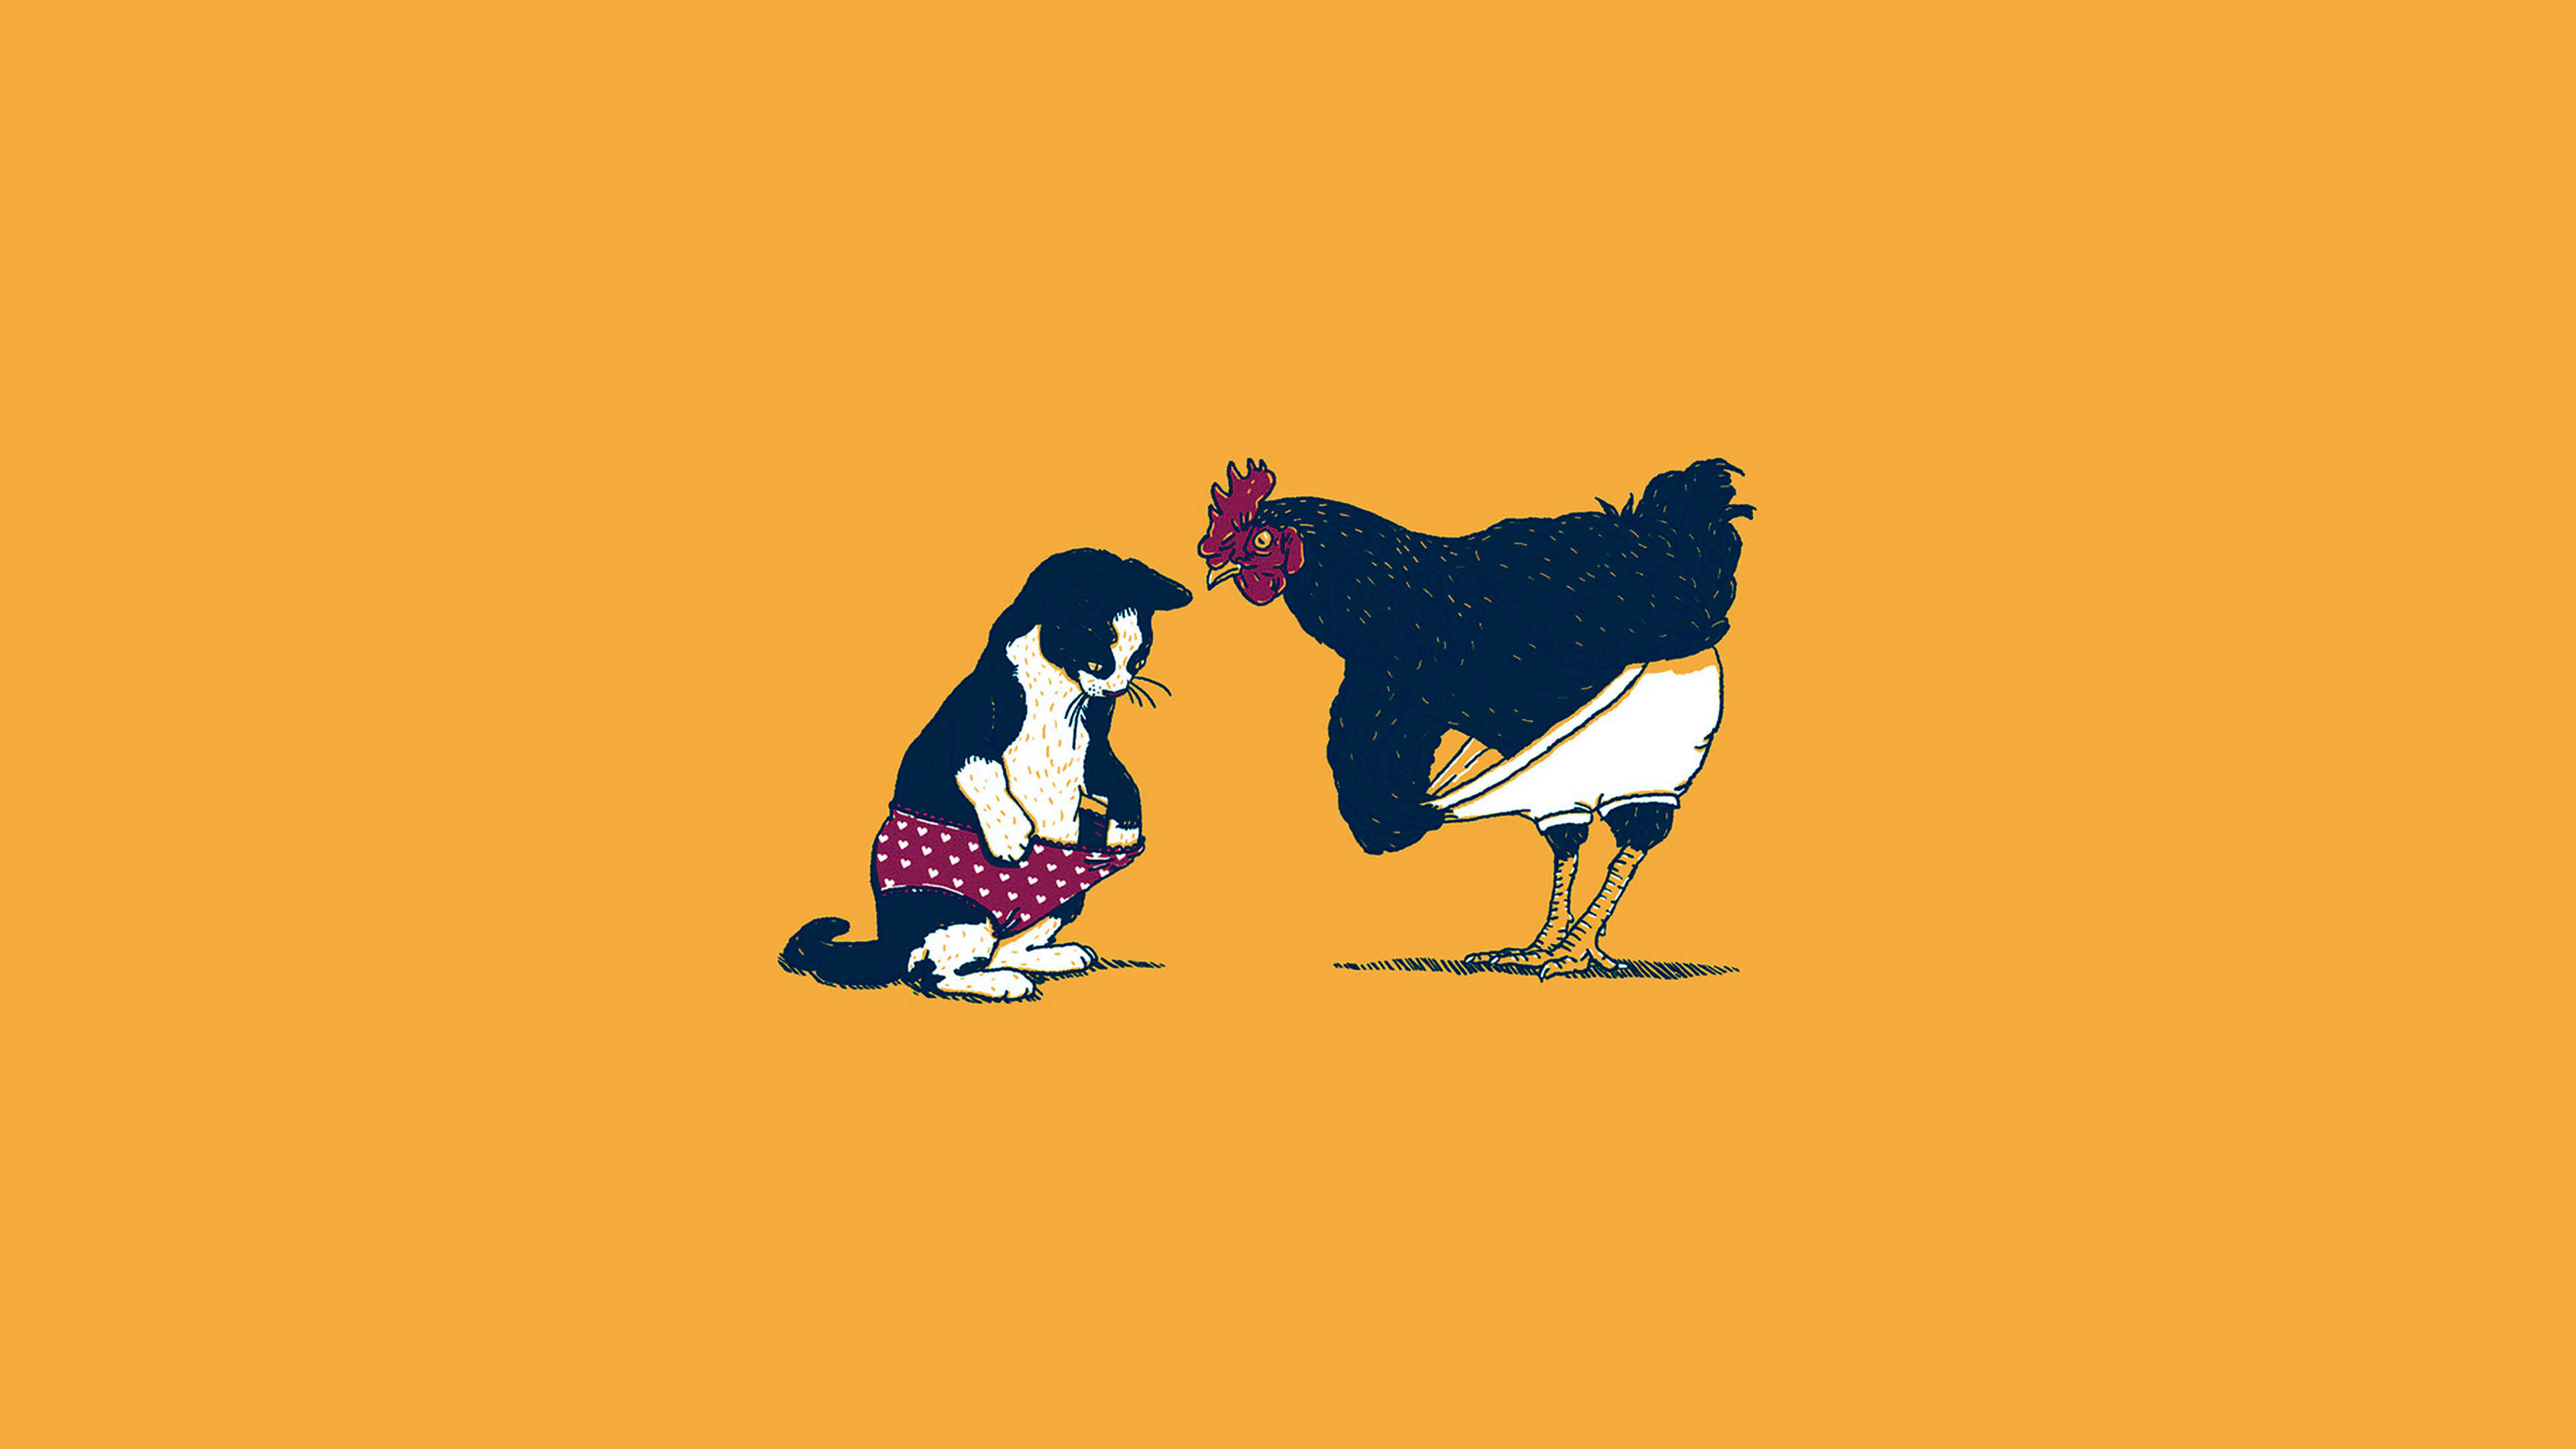 Ah83 Cat Chicken Yellow Underwear Cute Illust Art Wallpaper